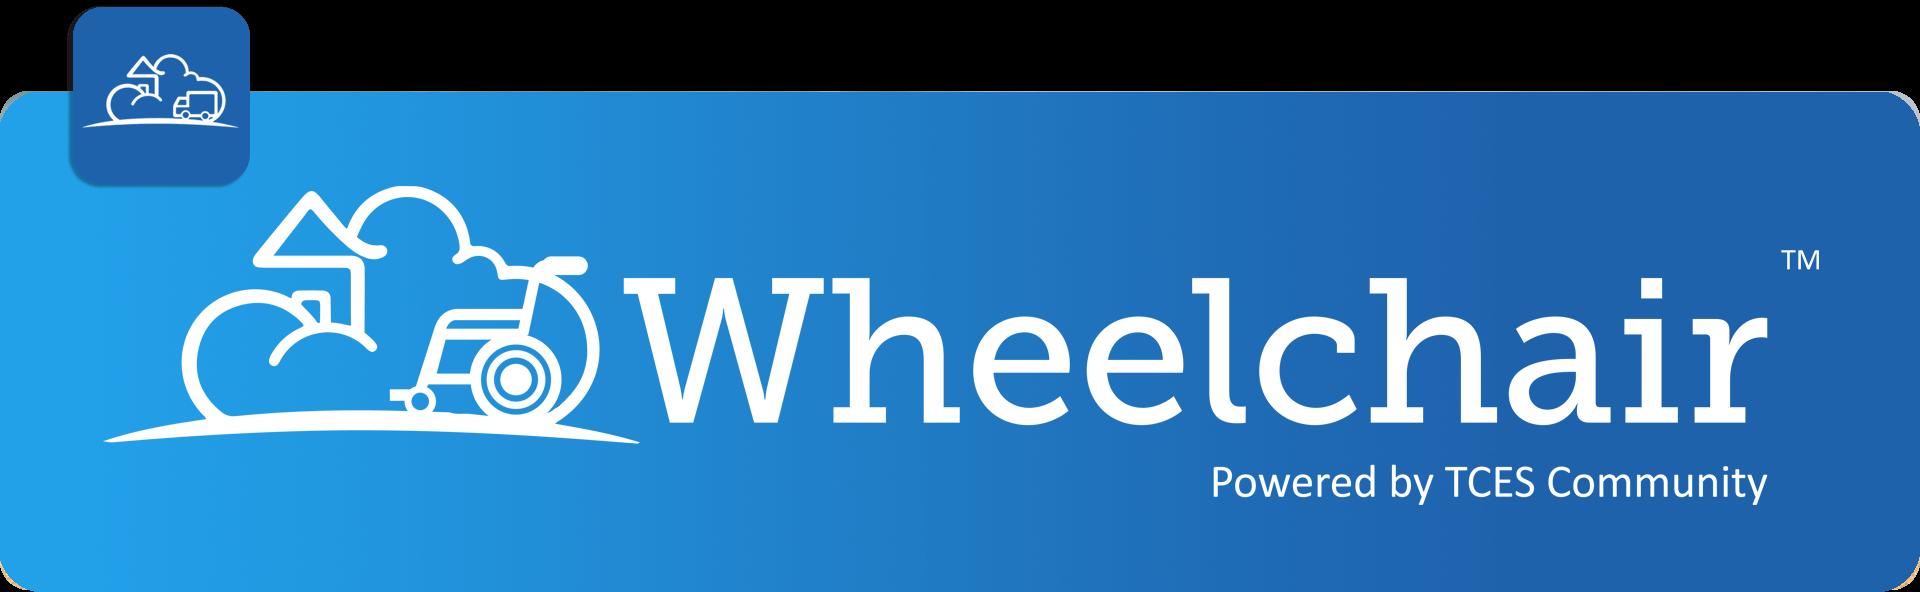 TCES Wheelchair logo